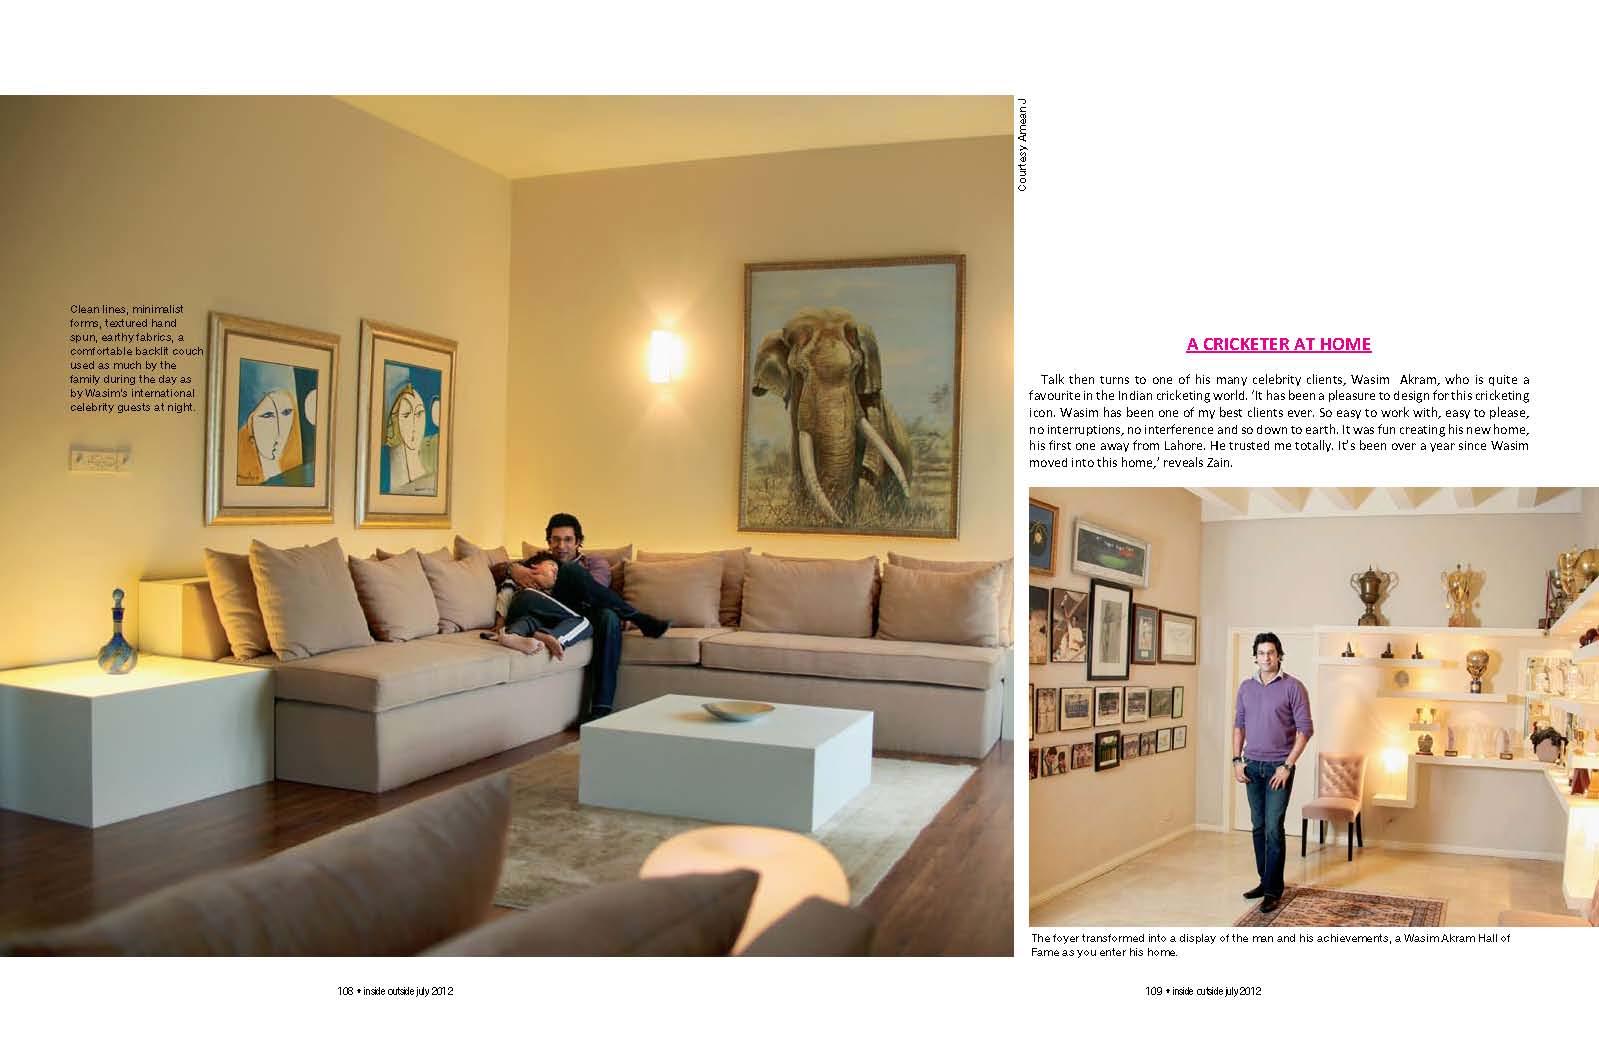 Visage fashion magazine pakistan 85